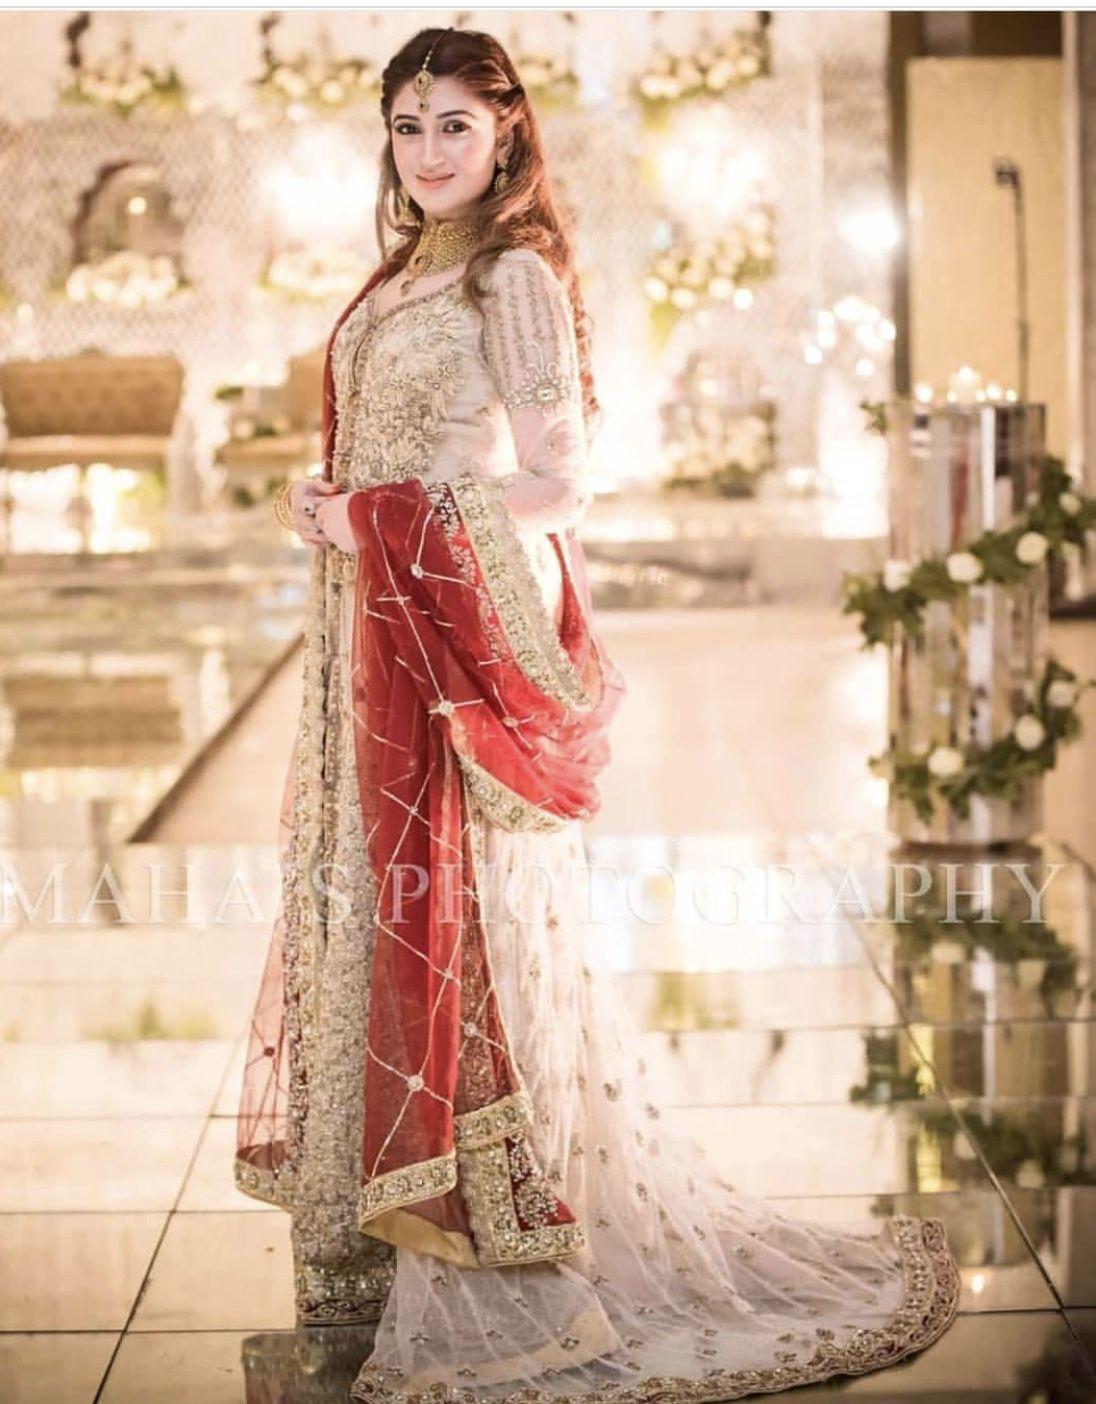 Pin by Susan on brautkleider | Pinterest | Pakistani, Bridle dress ...